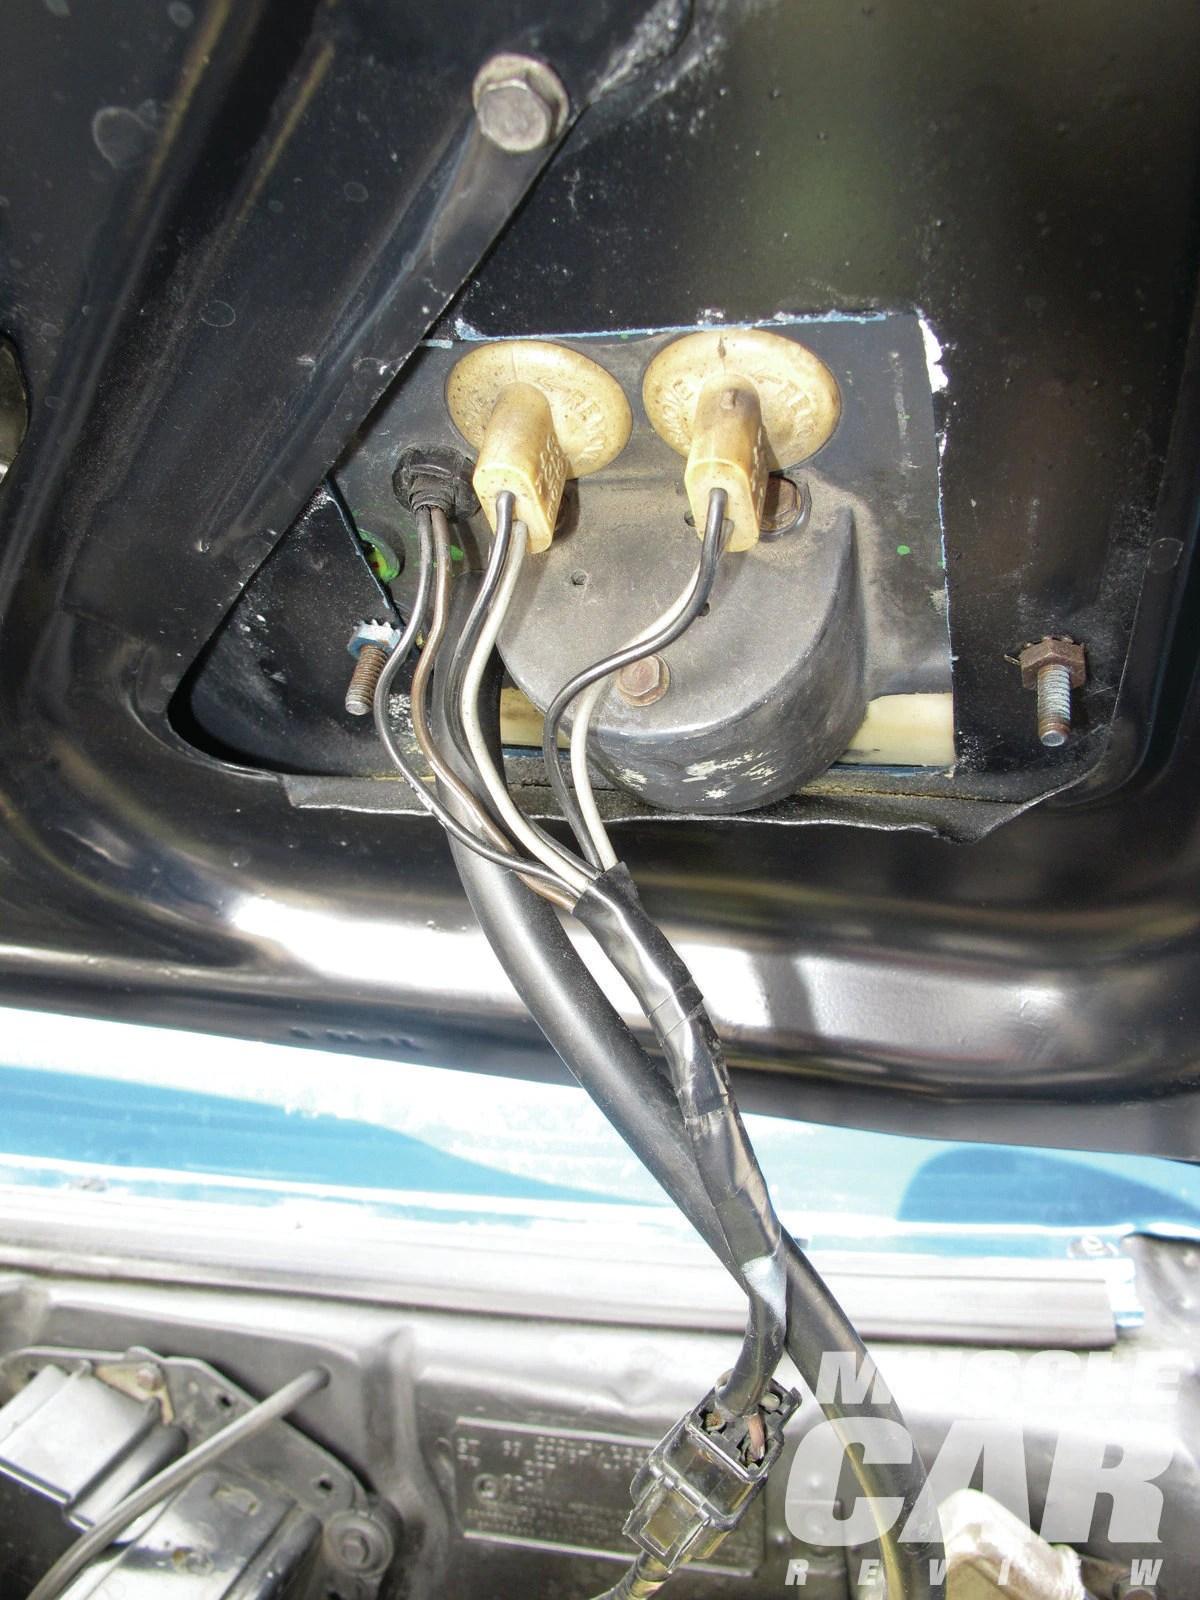 medium resolution of 1969 gto hood tach wiring wiring diagrams 68 gto dash wiring diagram 1967 gto hood tachometer wiring diagram